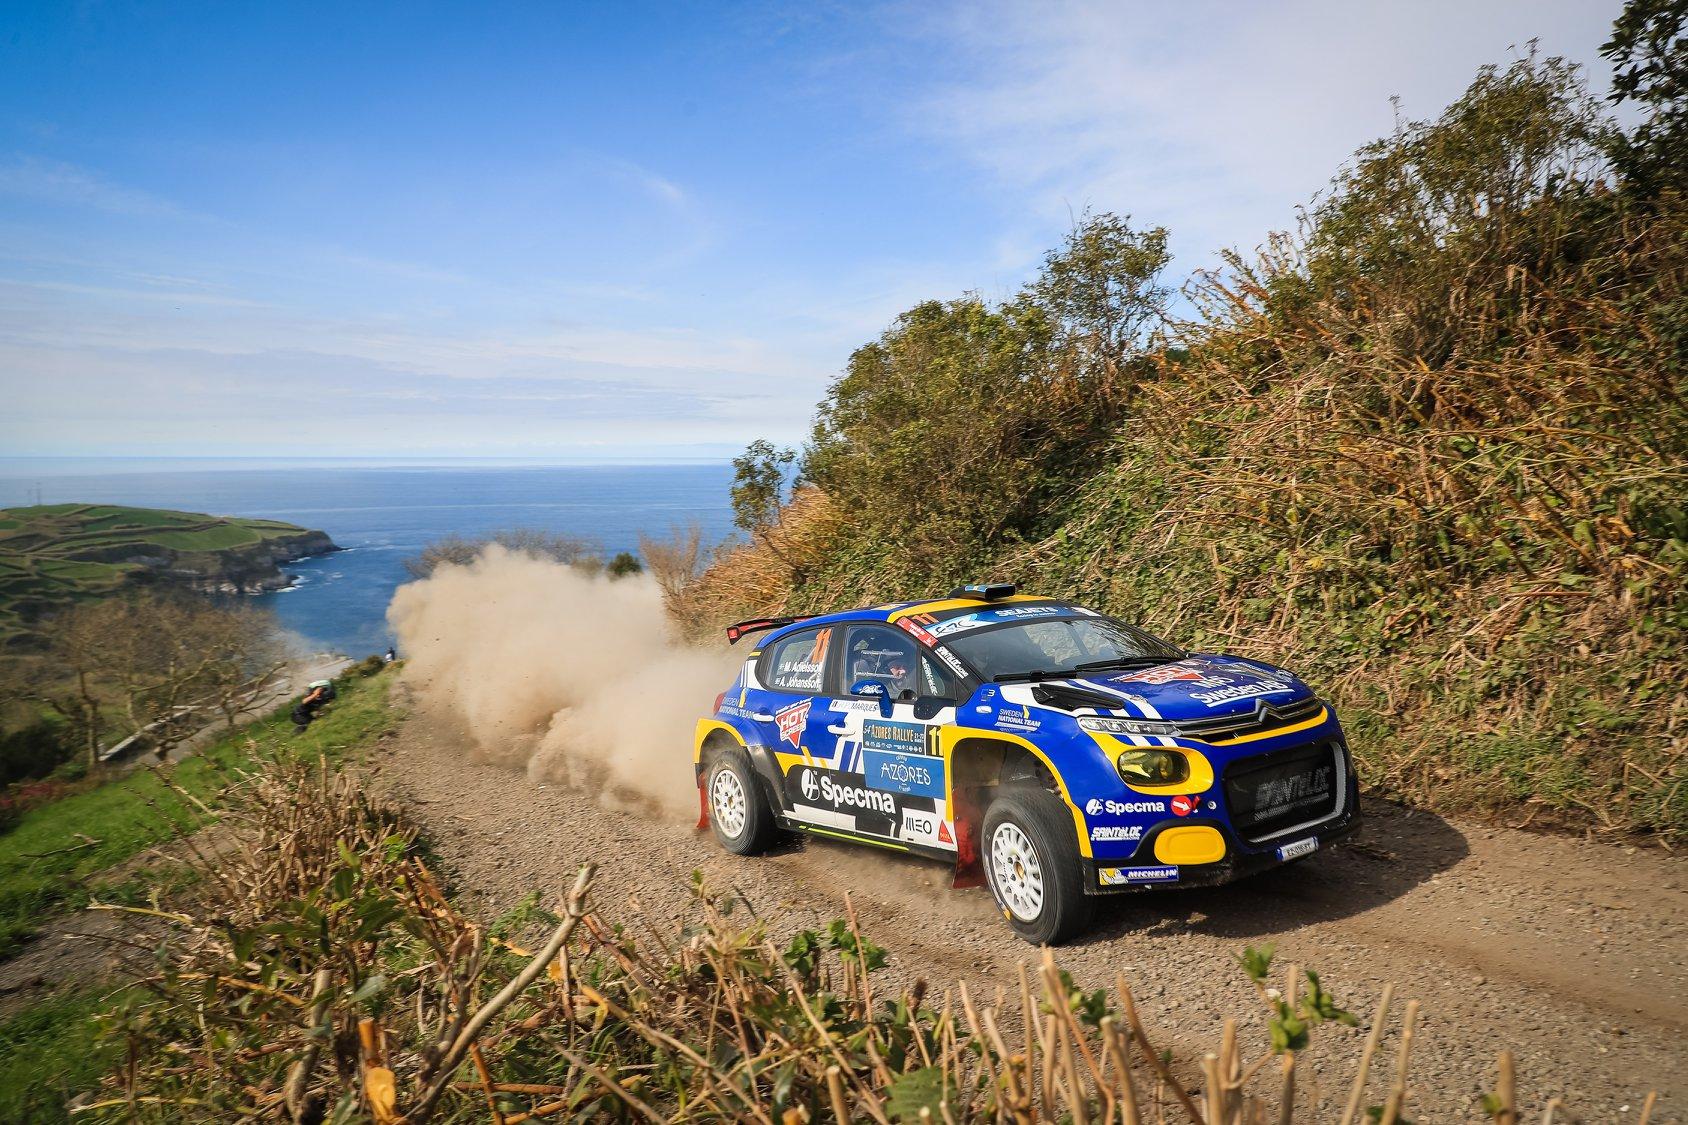 Azores Rallye 2021